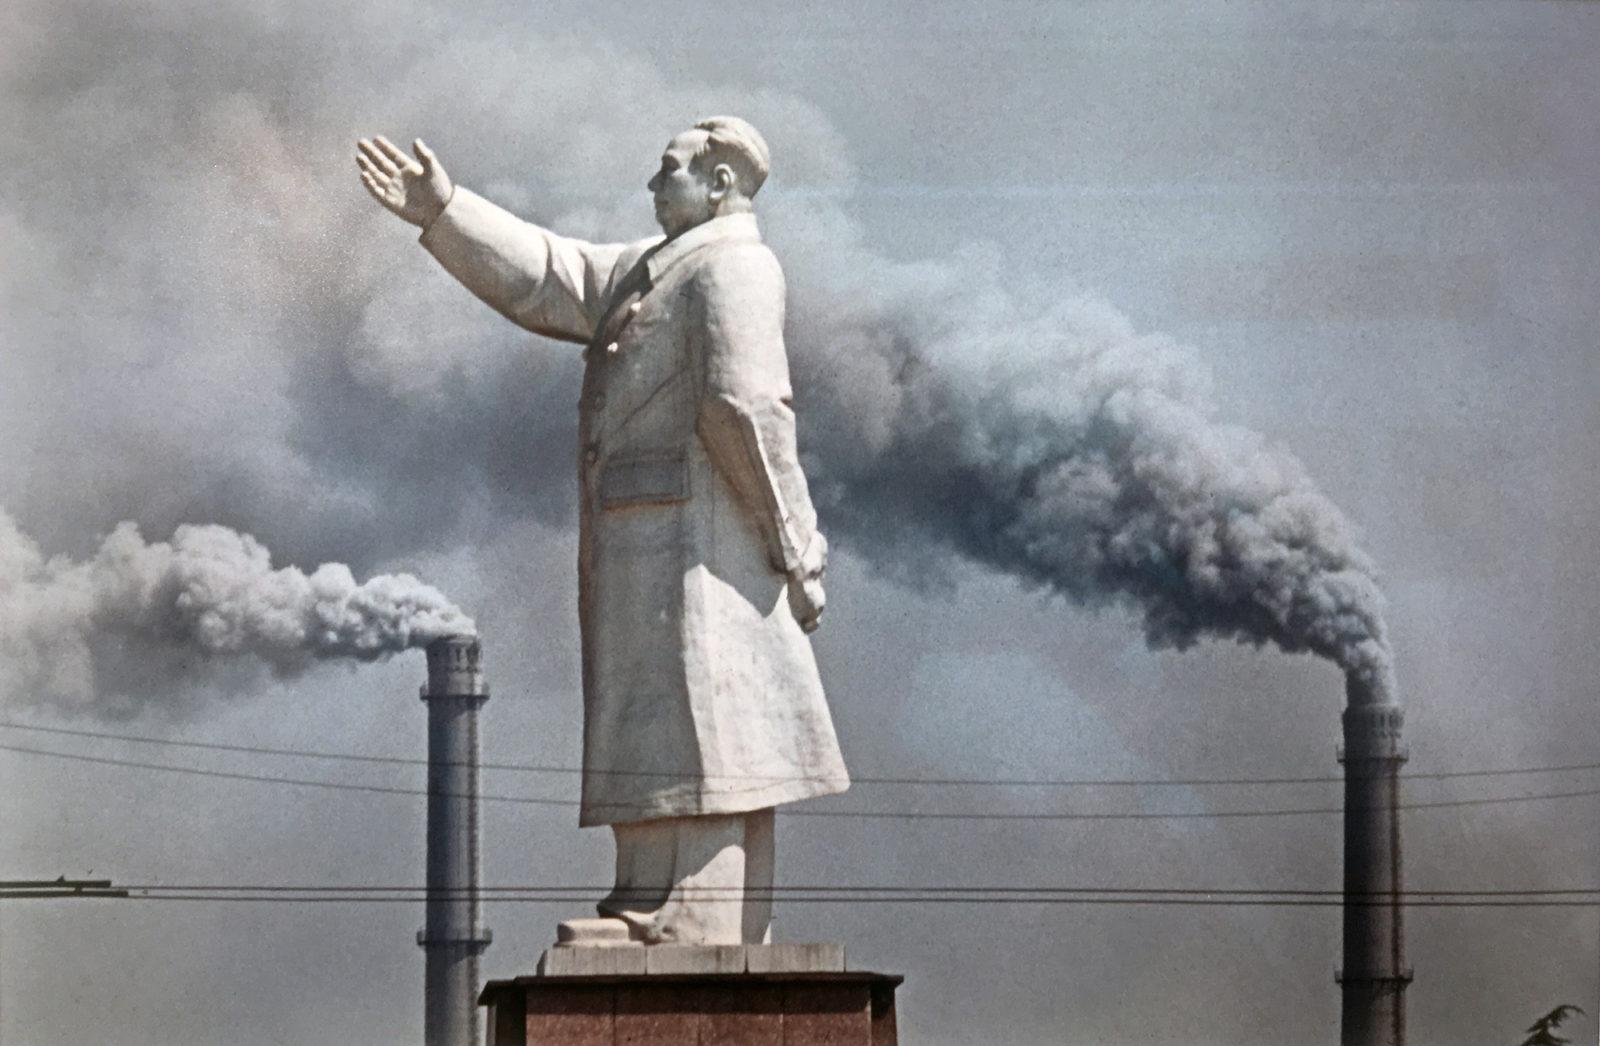 Marc Riboud: Mao Ce-tung szobor Wuhan-ban, 1971, a Month of Photography Bratislava 2018 jóvoltából